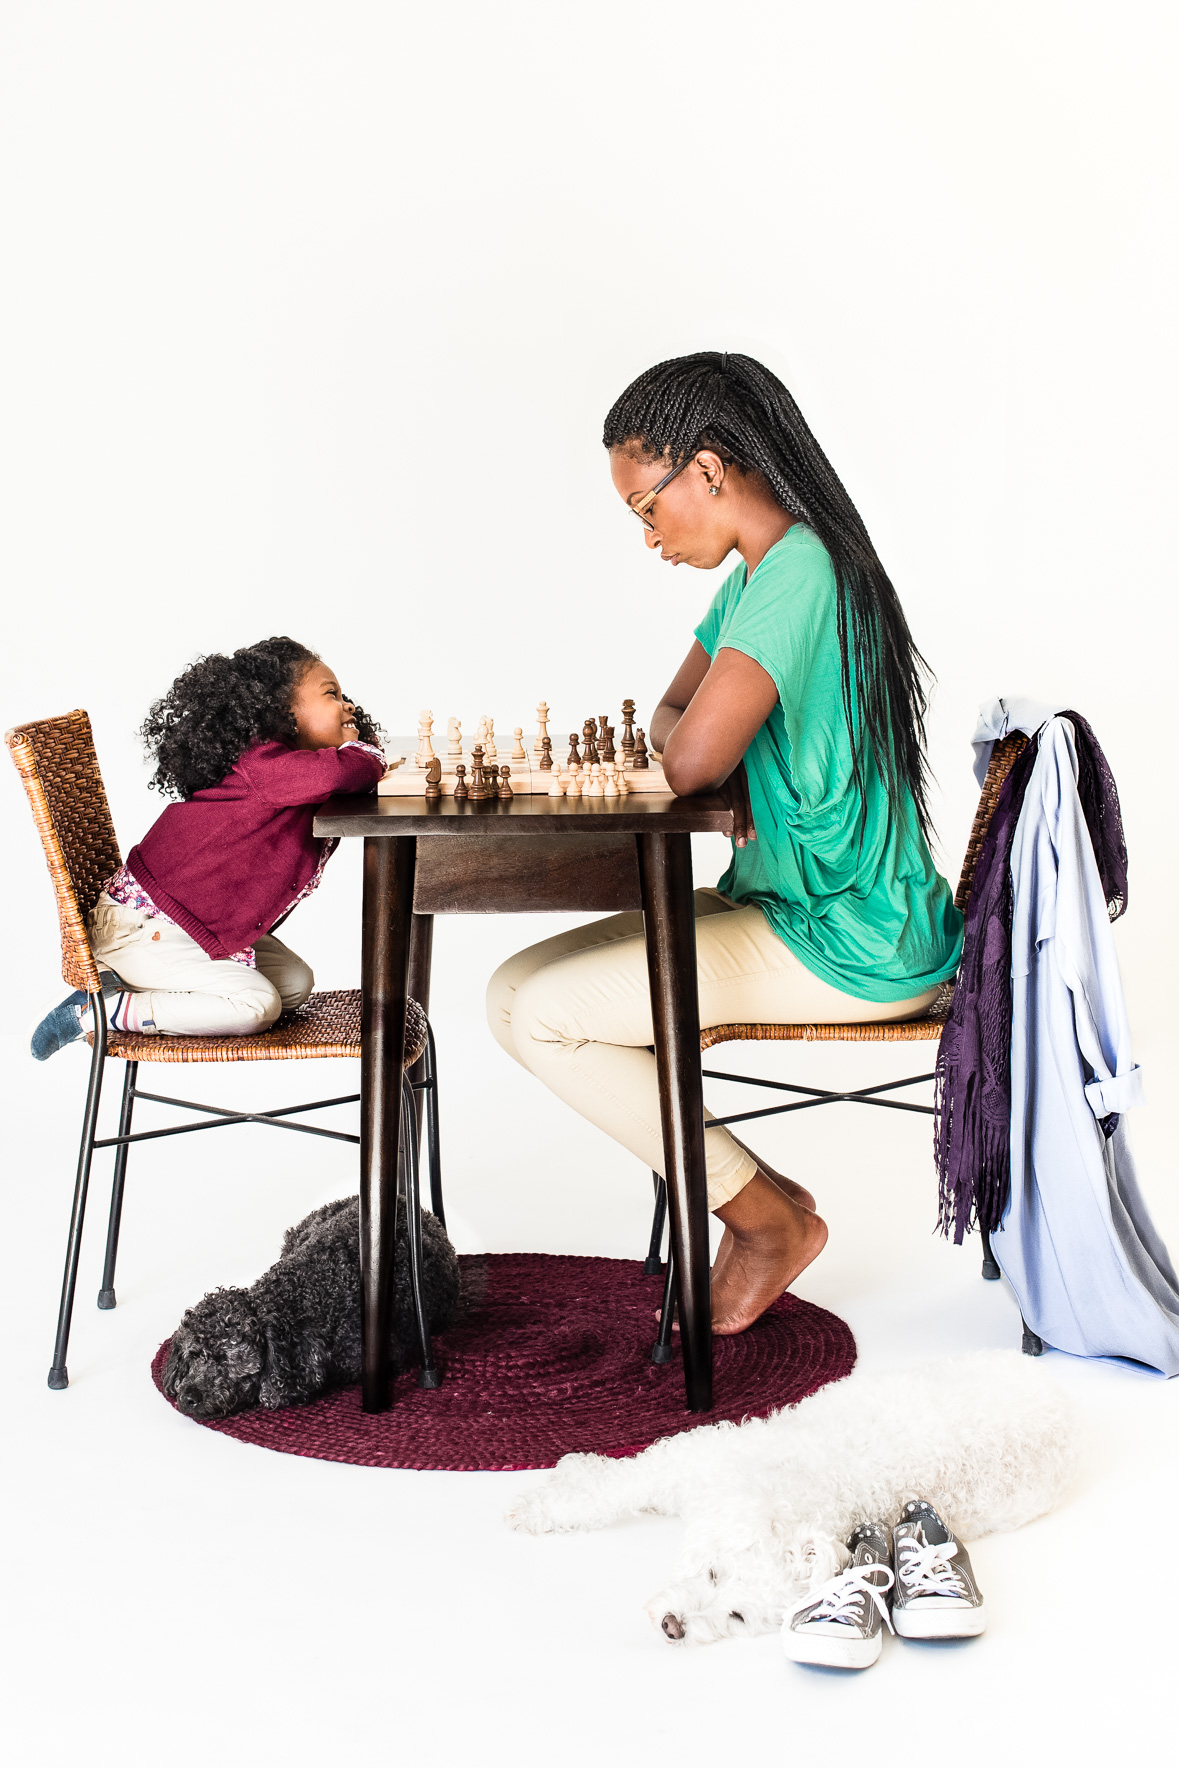 20150903-ava-chess-240-219.jpg